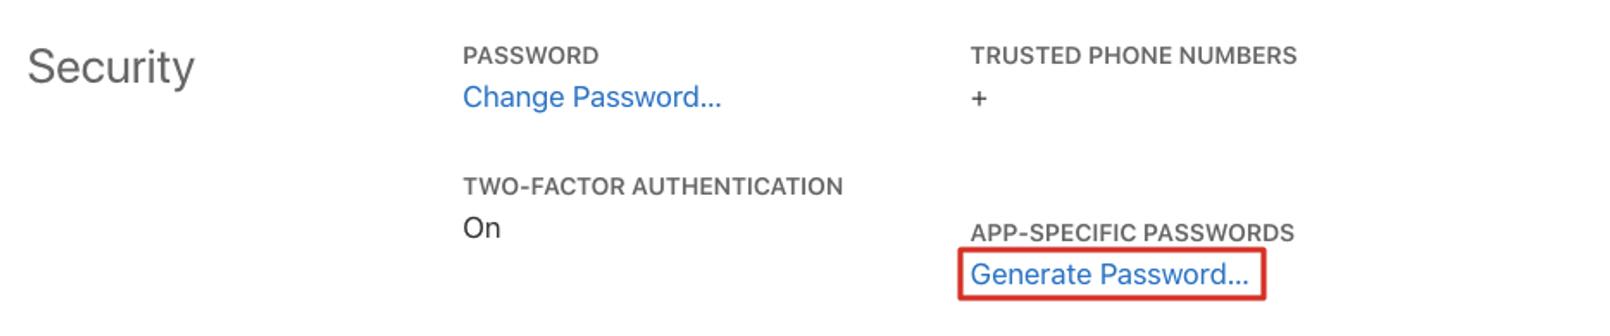 apple app-specific password